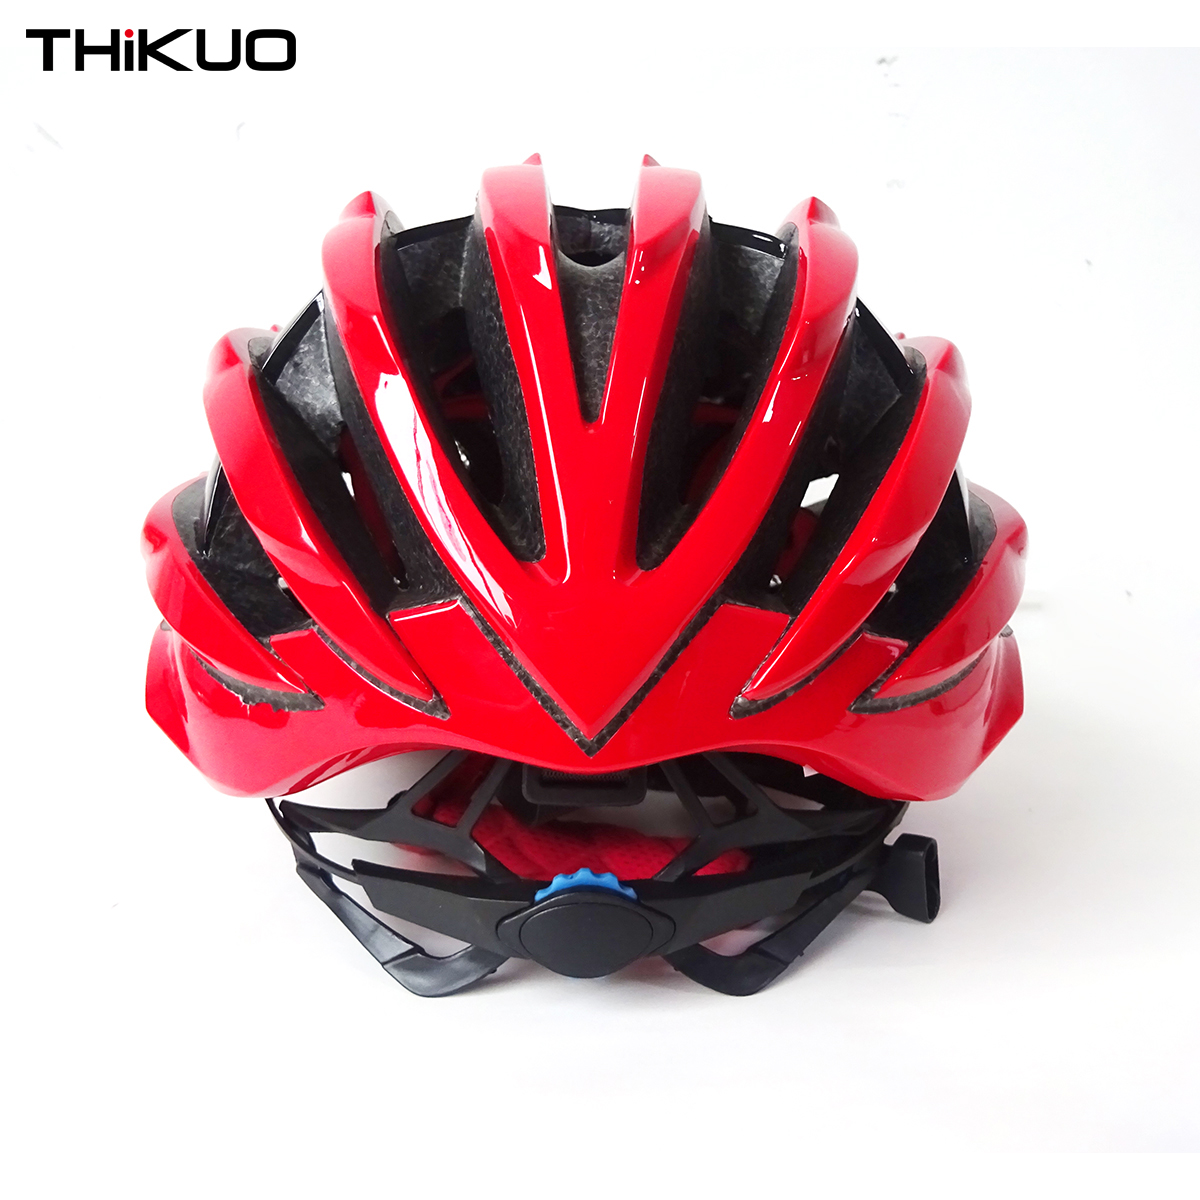 Hedgehog shape bicycle one-piece helmet light weight road bike wemen cycling helmets TH-760 4